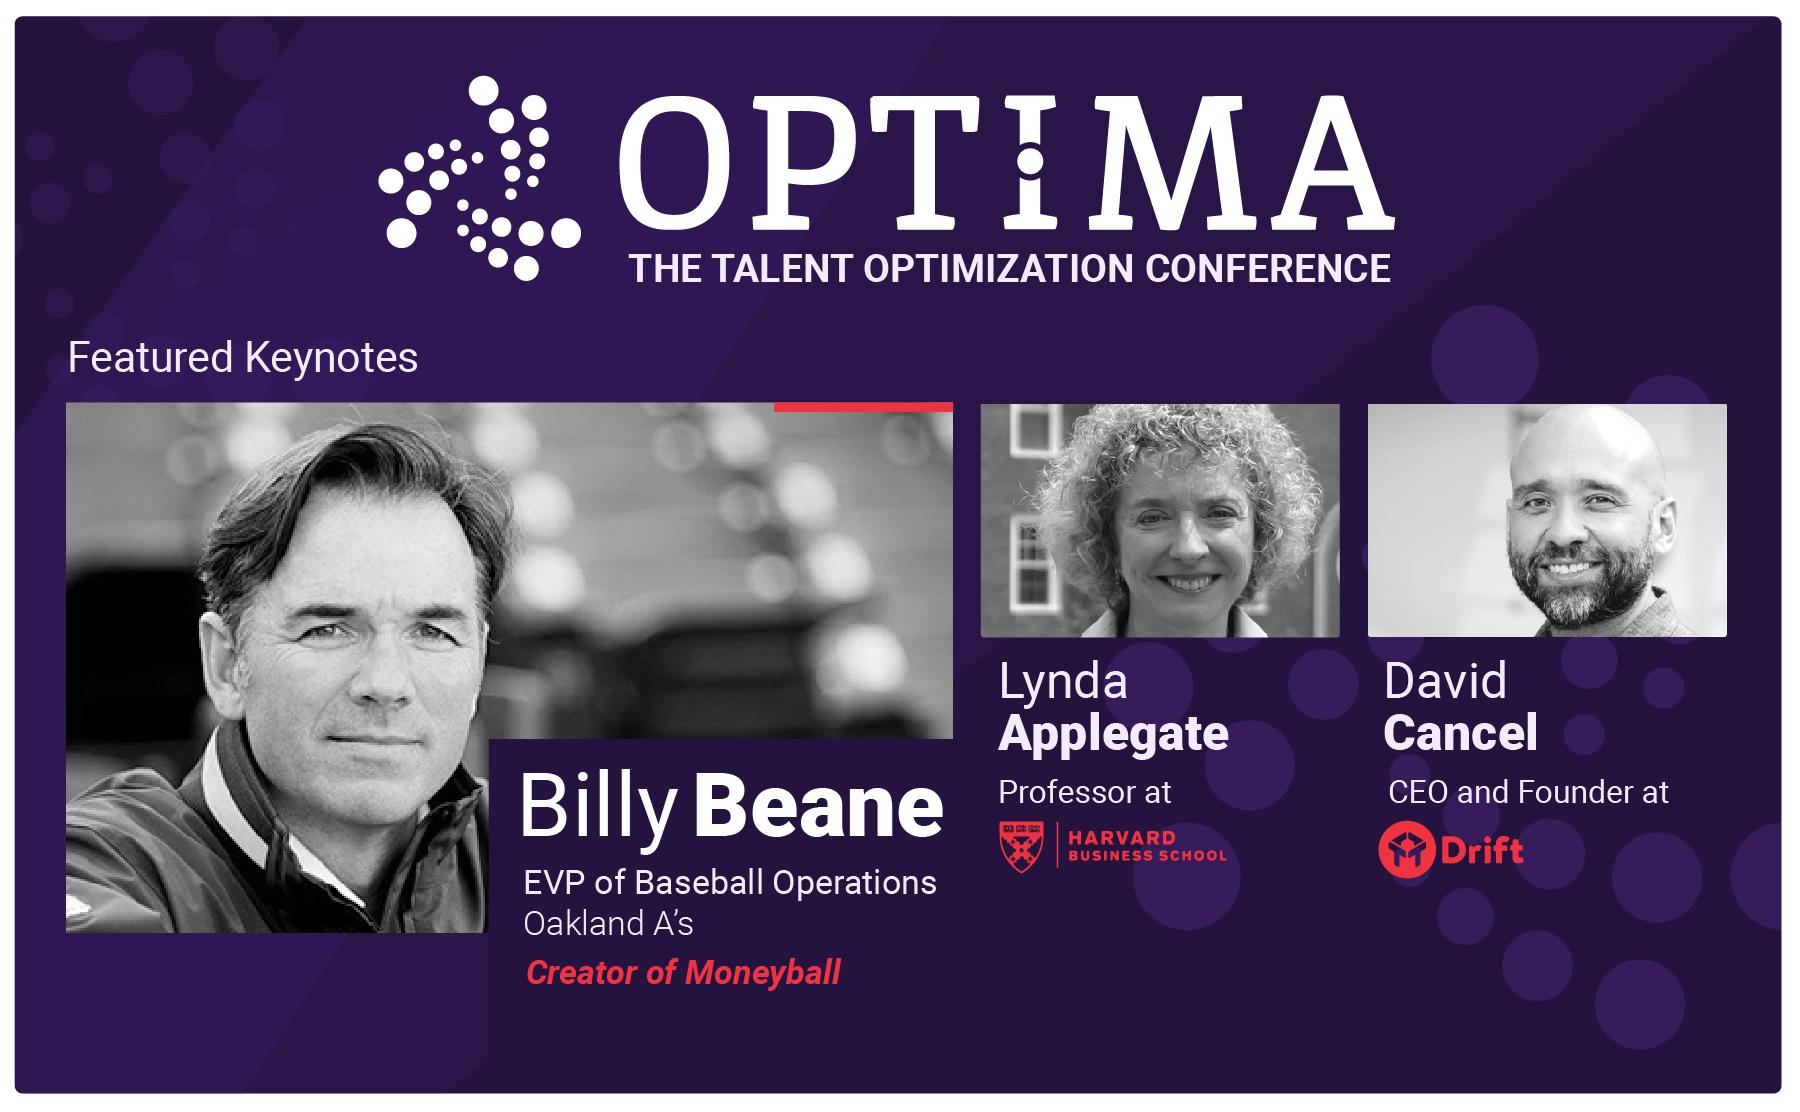 OPTIMA talent optimization conference The Predictive Index